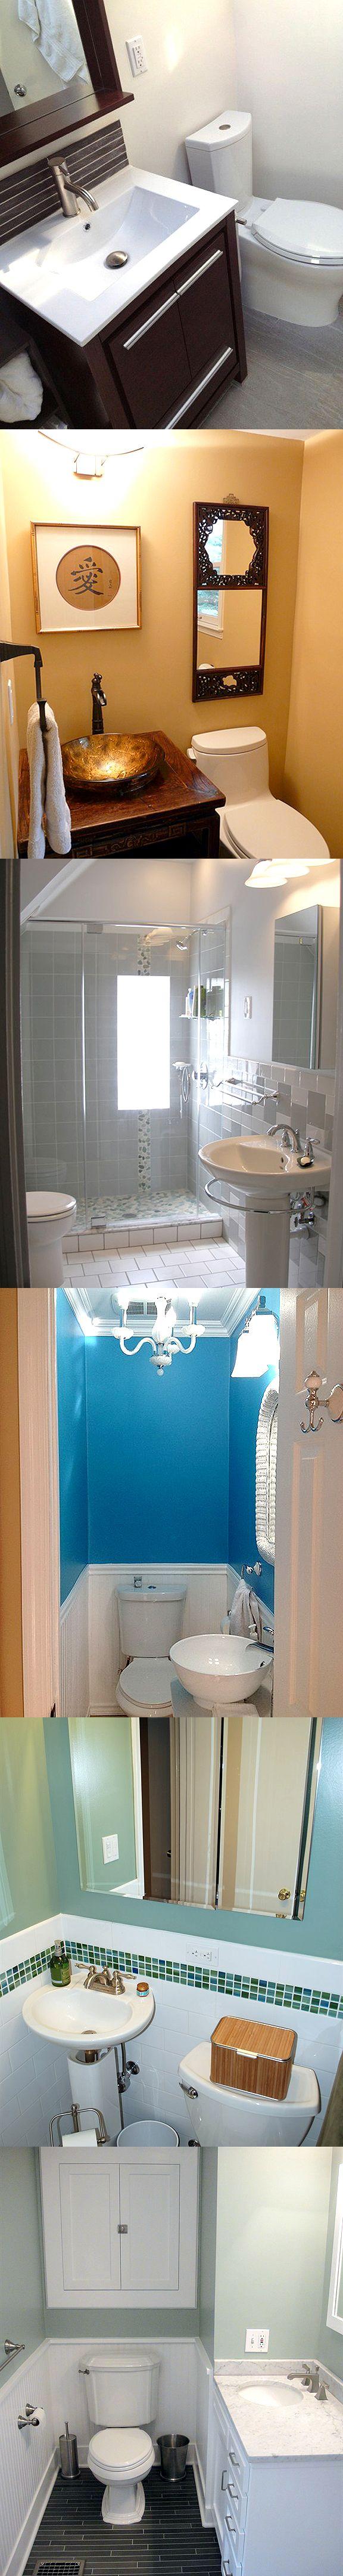 17 Best Images About Bathroom Comfort Room Toilet Designs